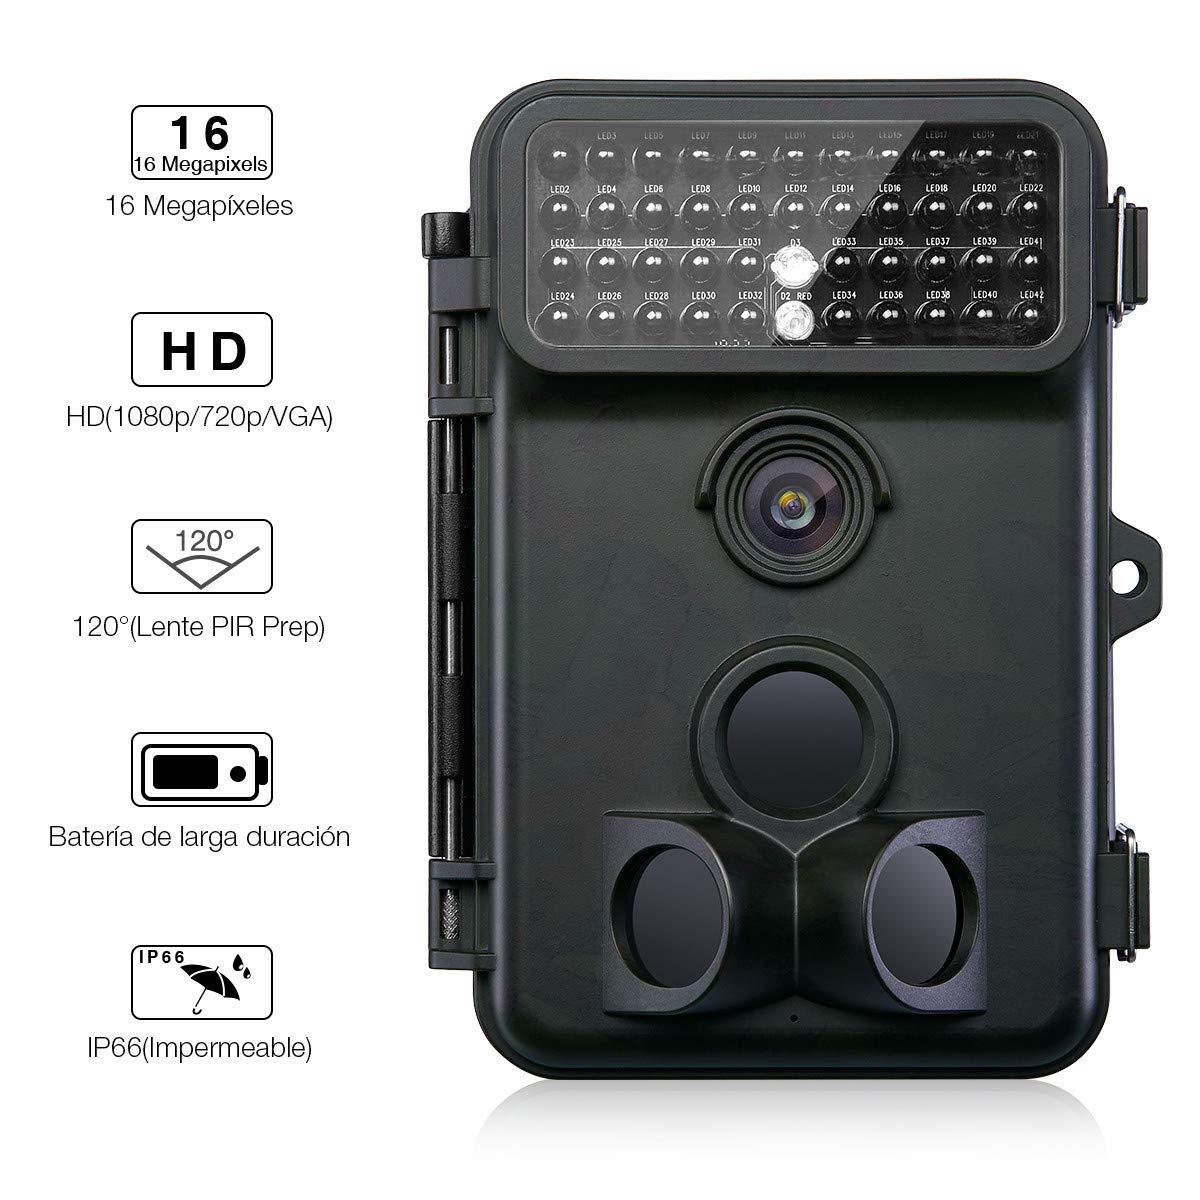 Powerextra Cámara de Caza Vigilancia 16MP Full HD 1080P Angular Amplio de 120° 42pcs IR